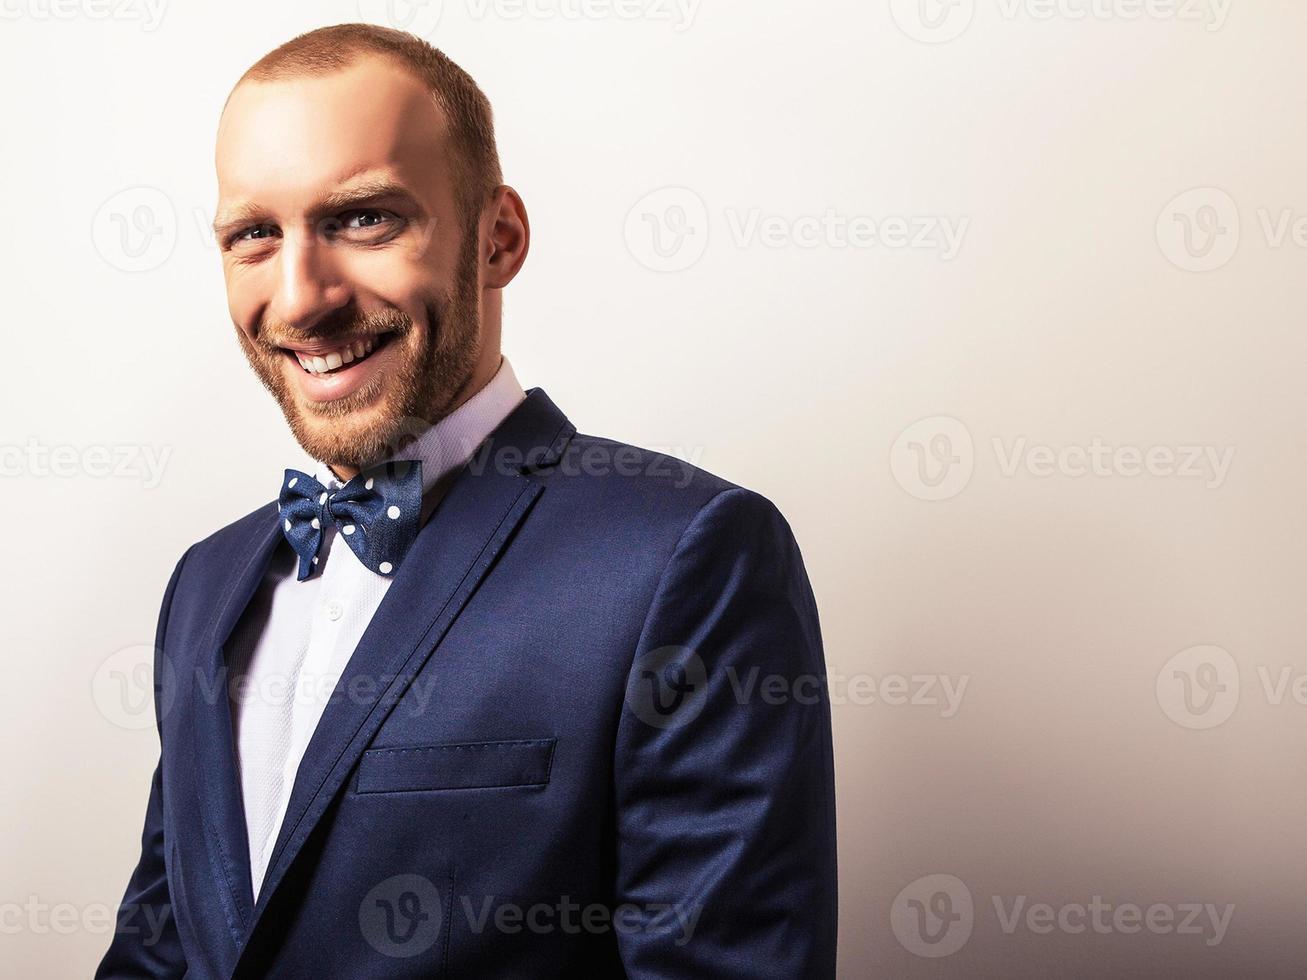 Elegante joven guapo en traje azul oscuro. foto